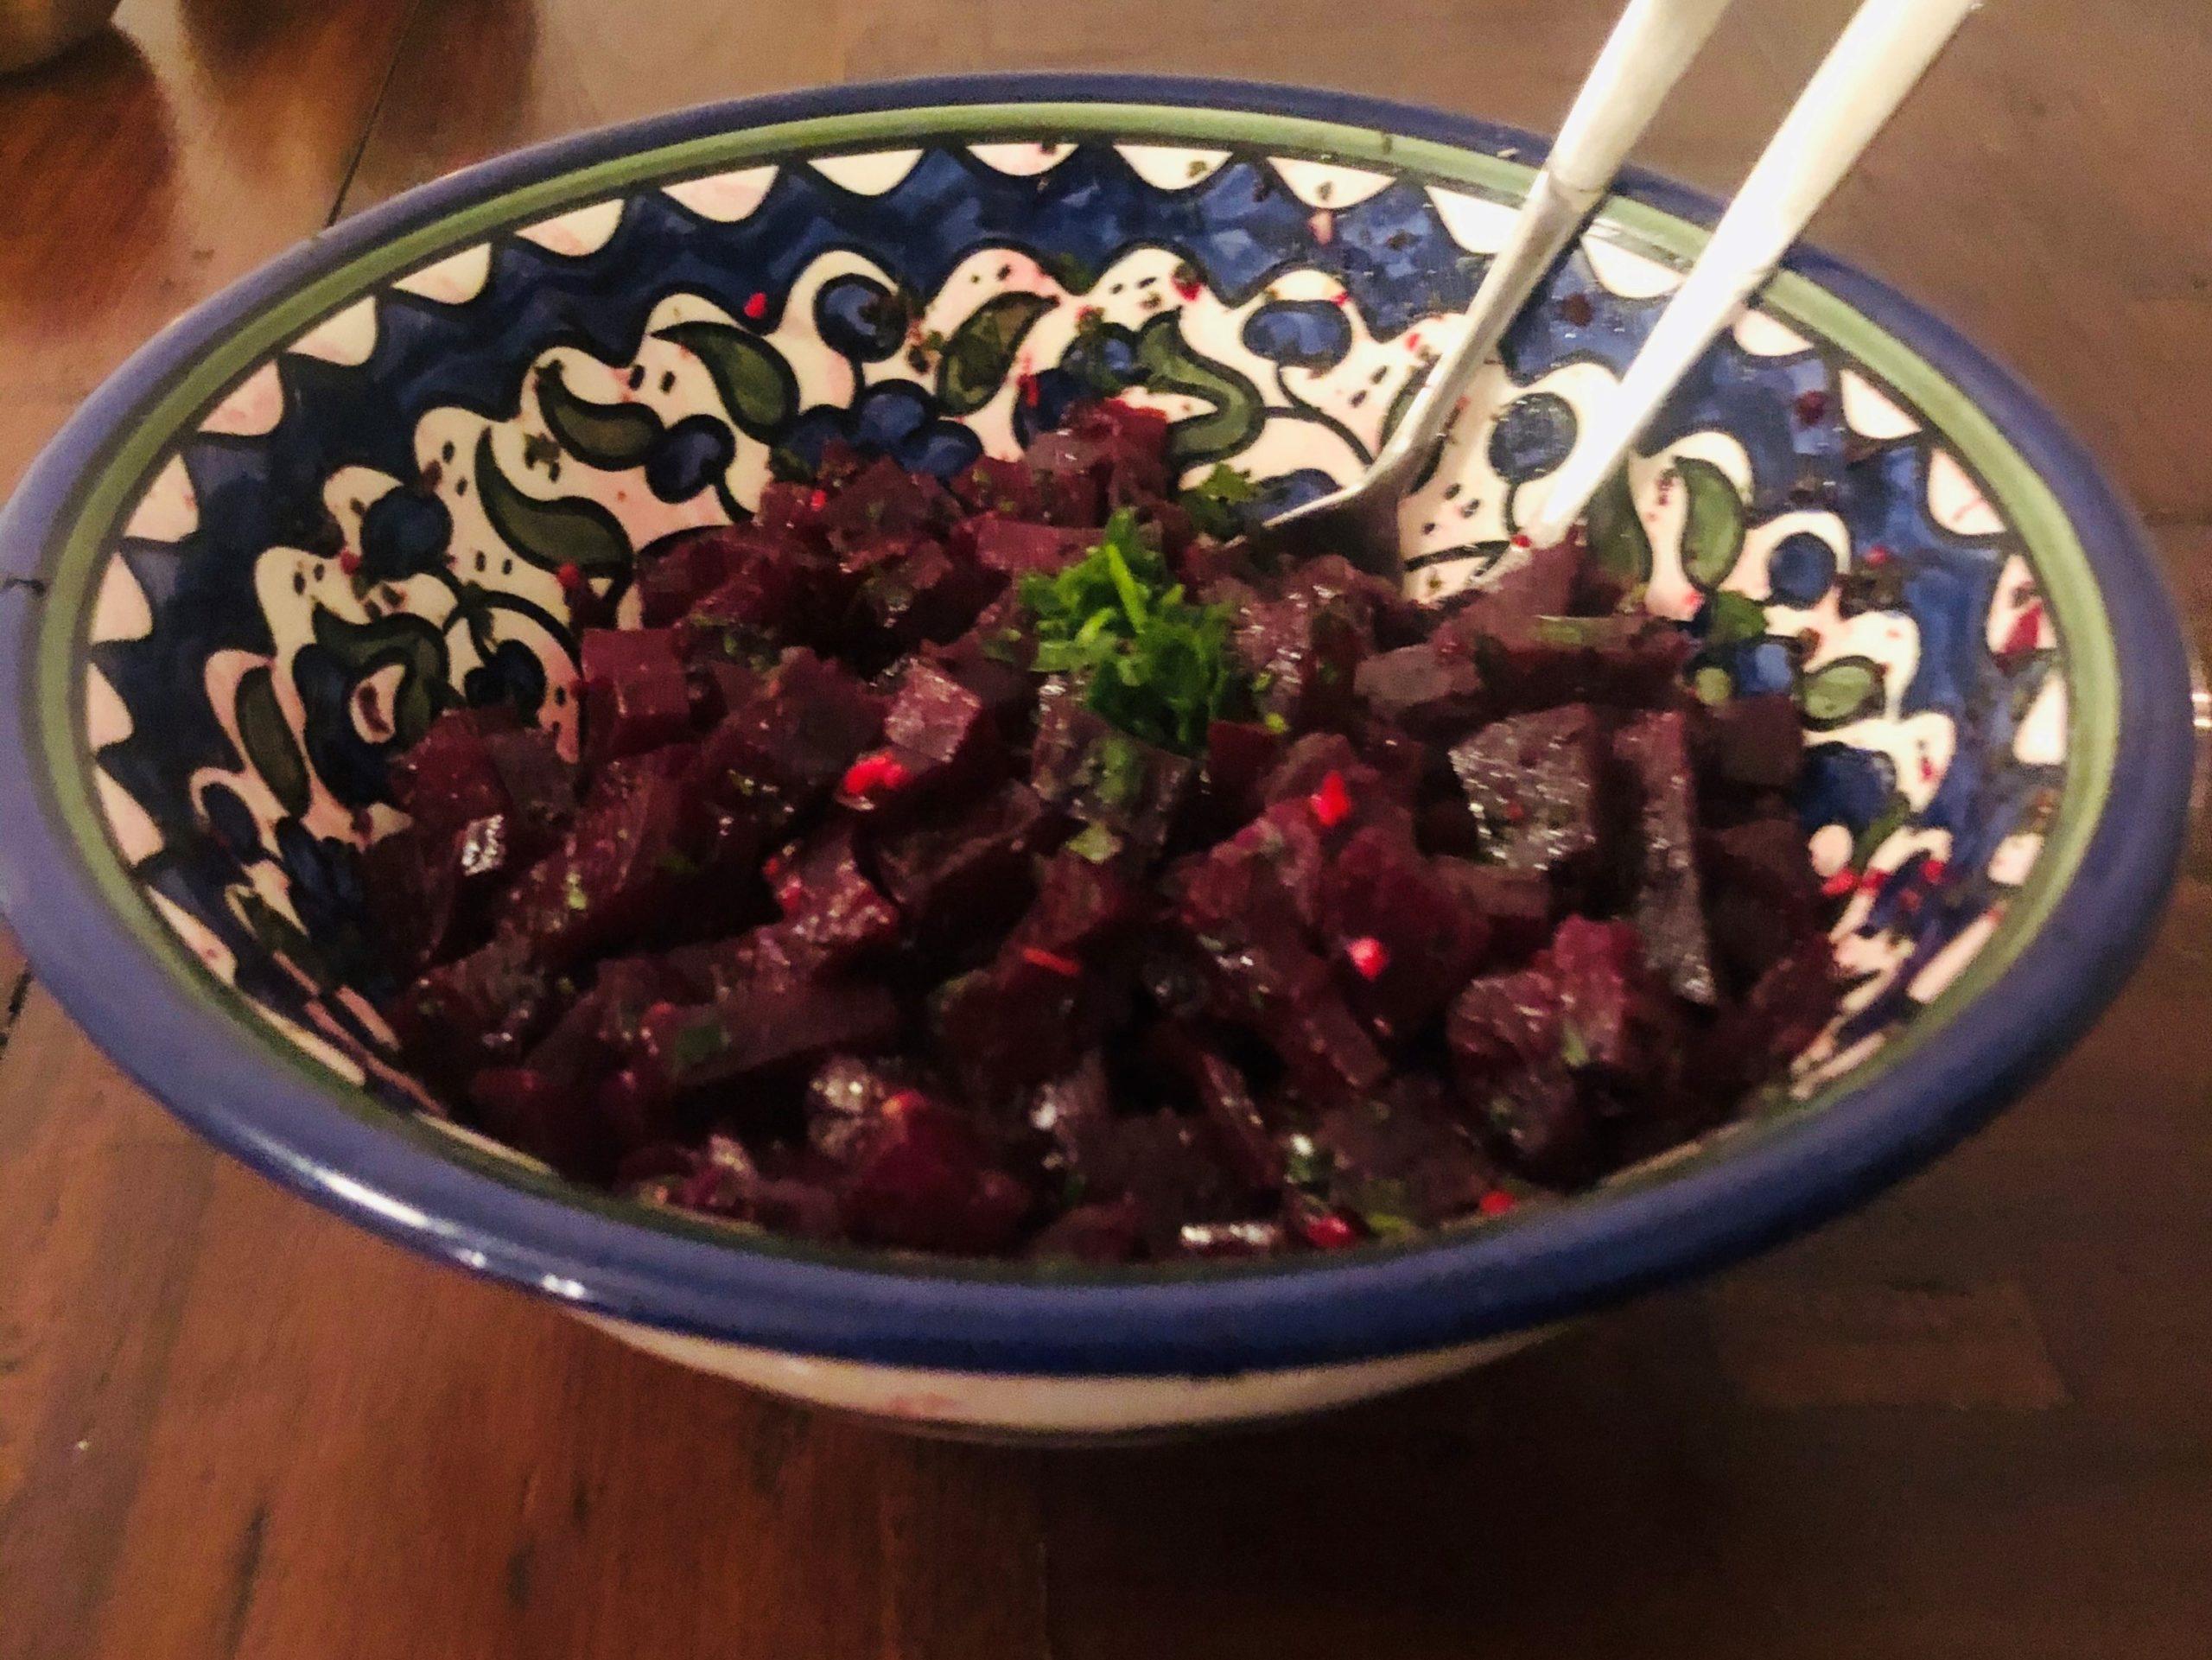 Veganer Rote Beete Salat - Beetroot salad